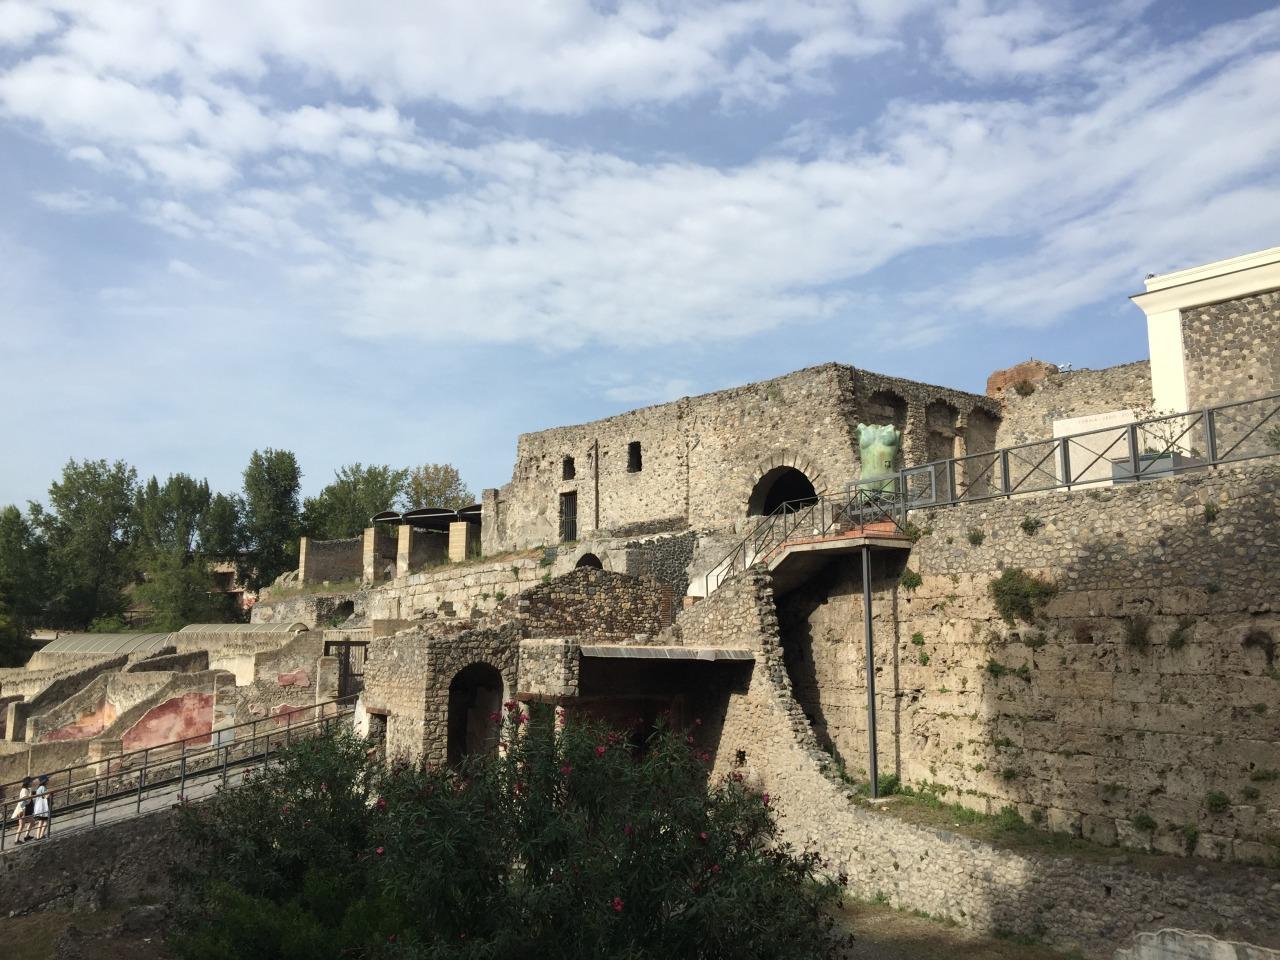 Day 13: Scalea - Pompeii